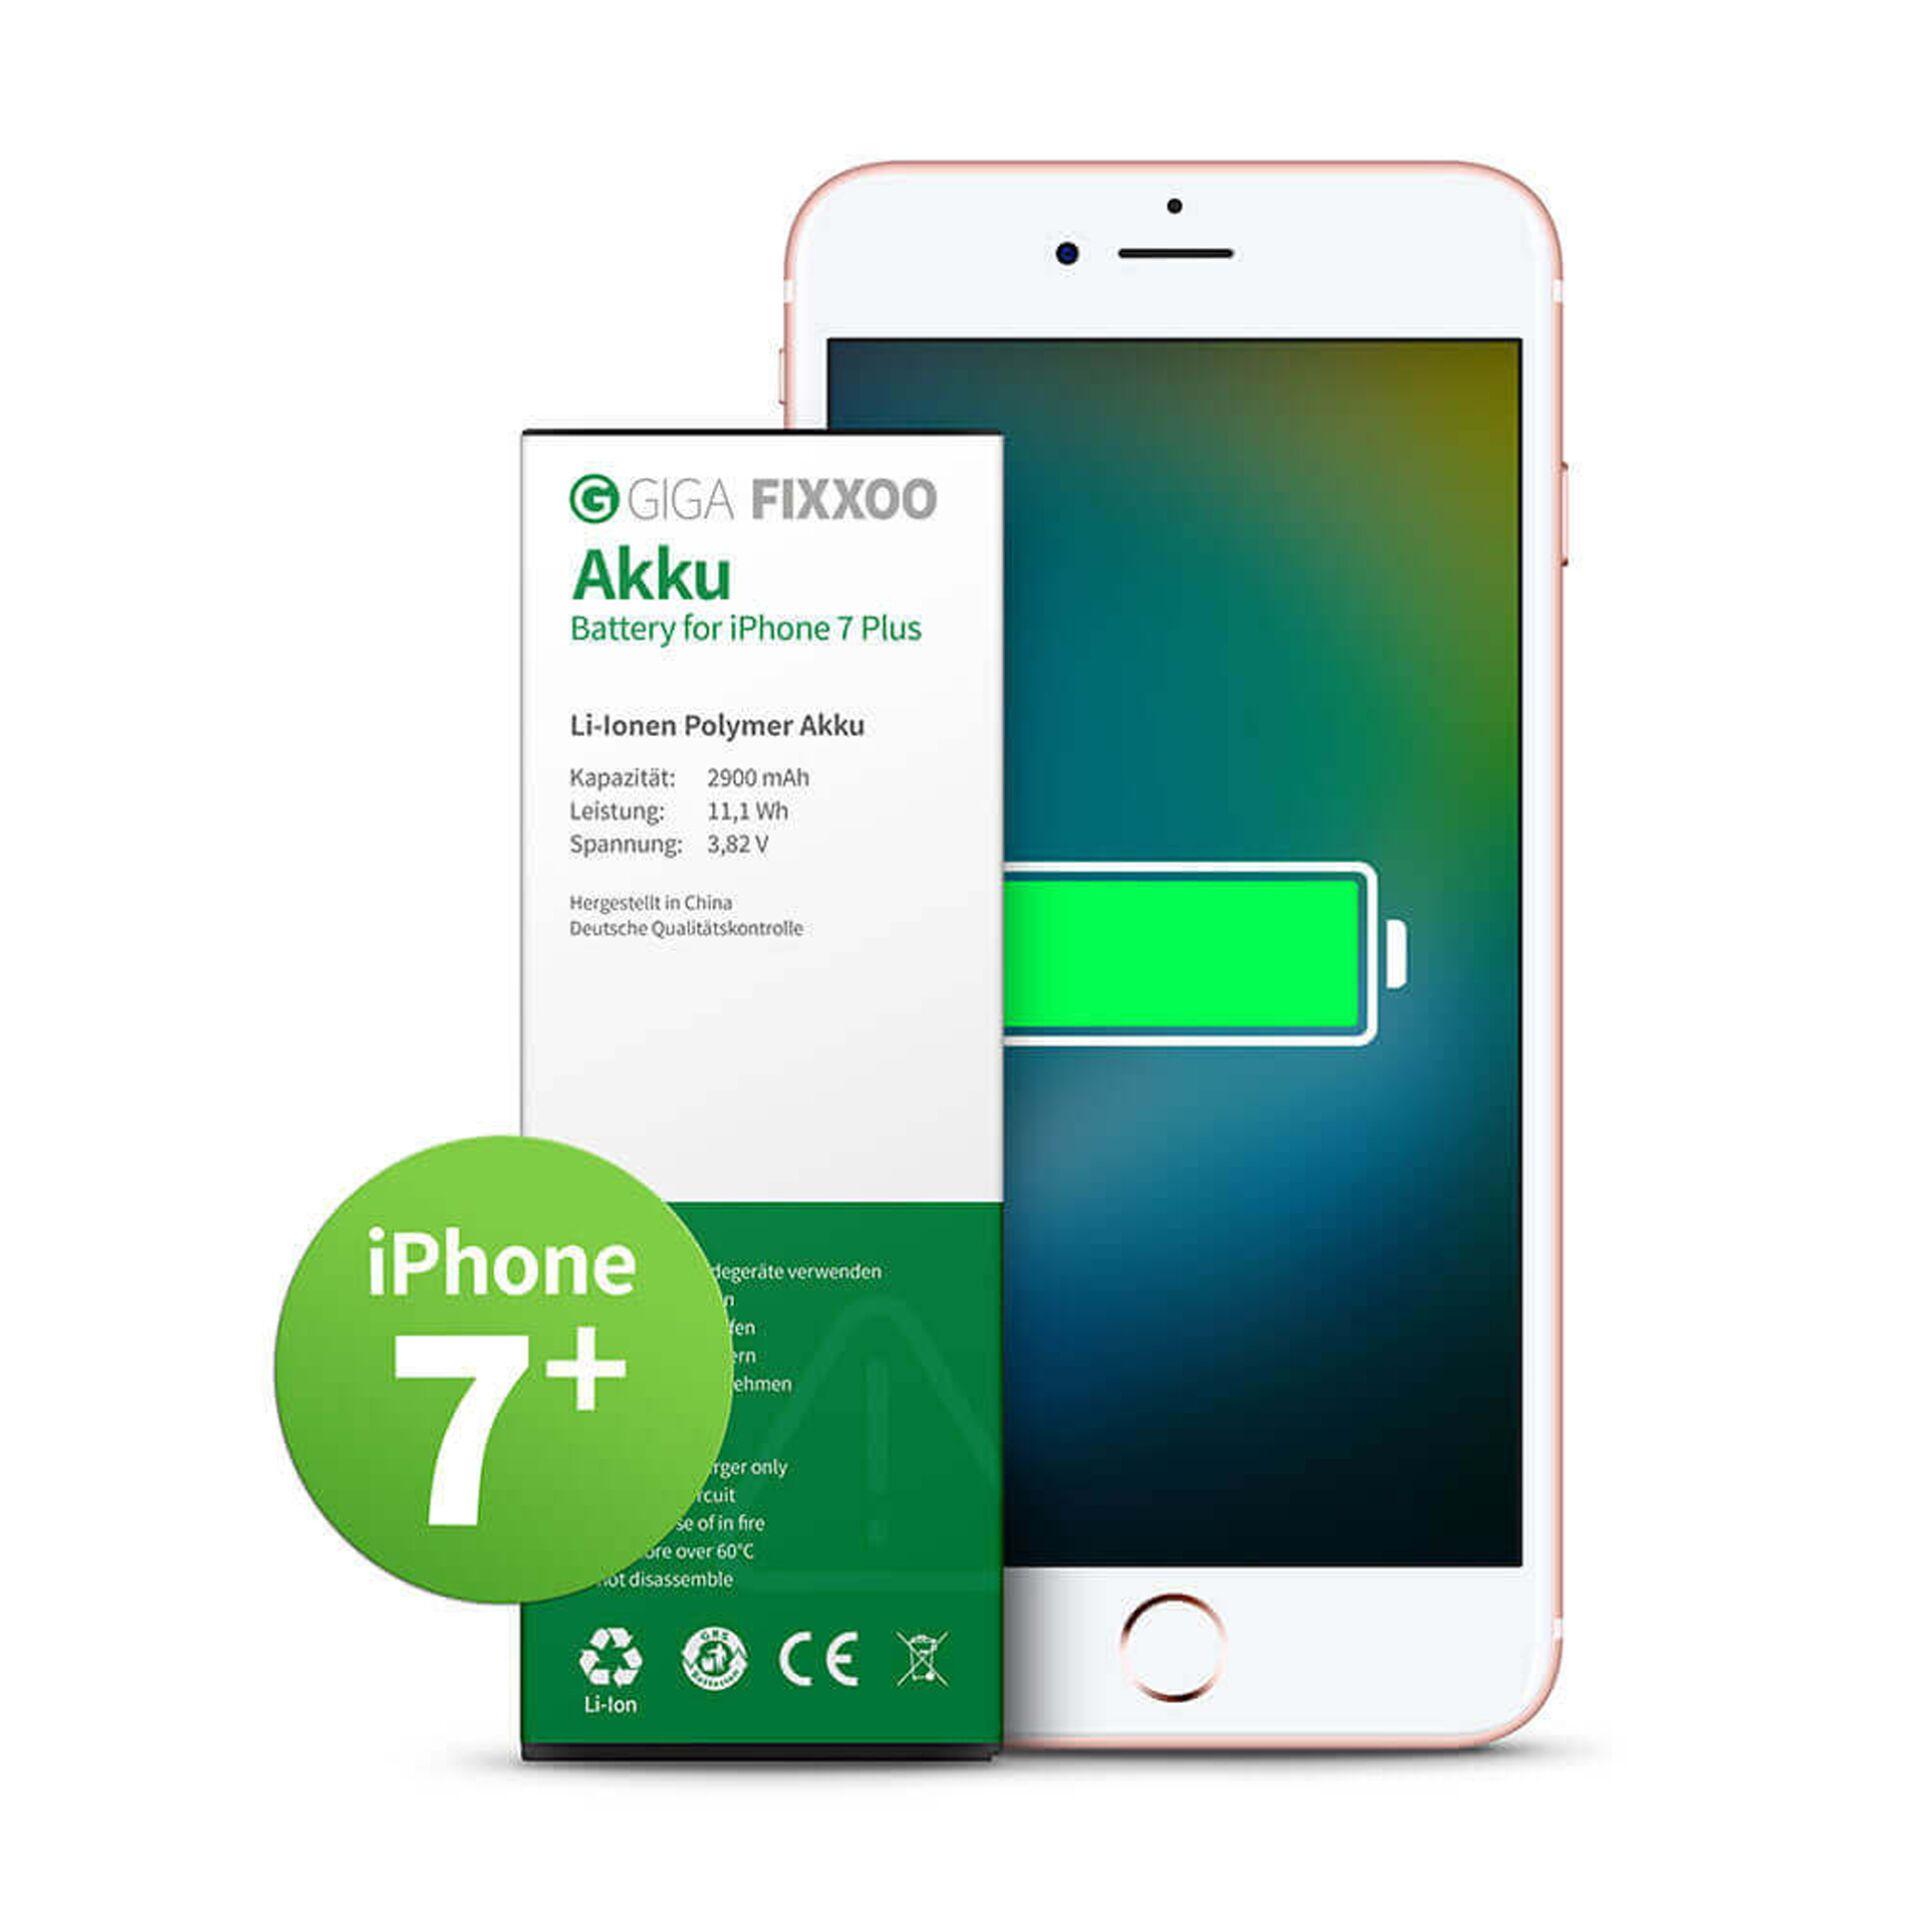 GIGA Fixxoo iPhone 7 Plus Akku